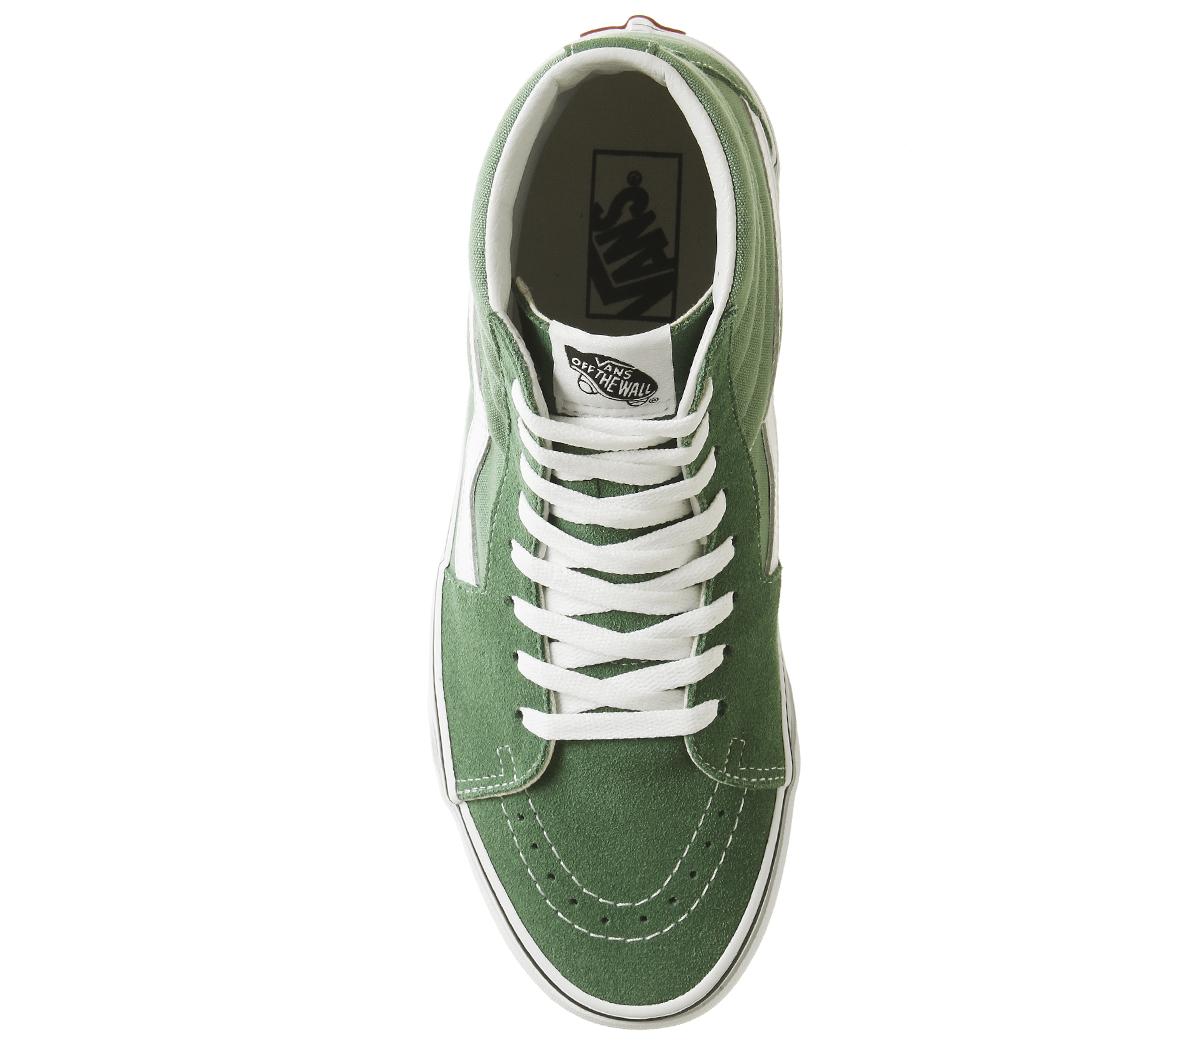 bdd5ed6892c Sentinel Womens Vans Sk8 Hi Trainers Deep Grass Green True White Trainers  Shoes